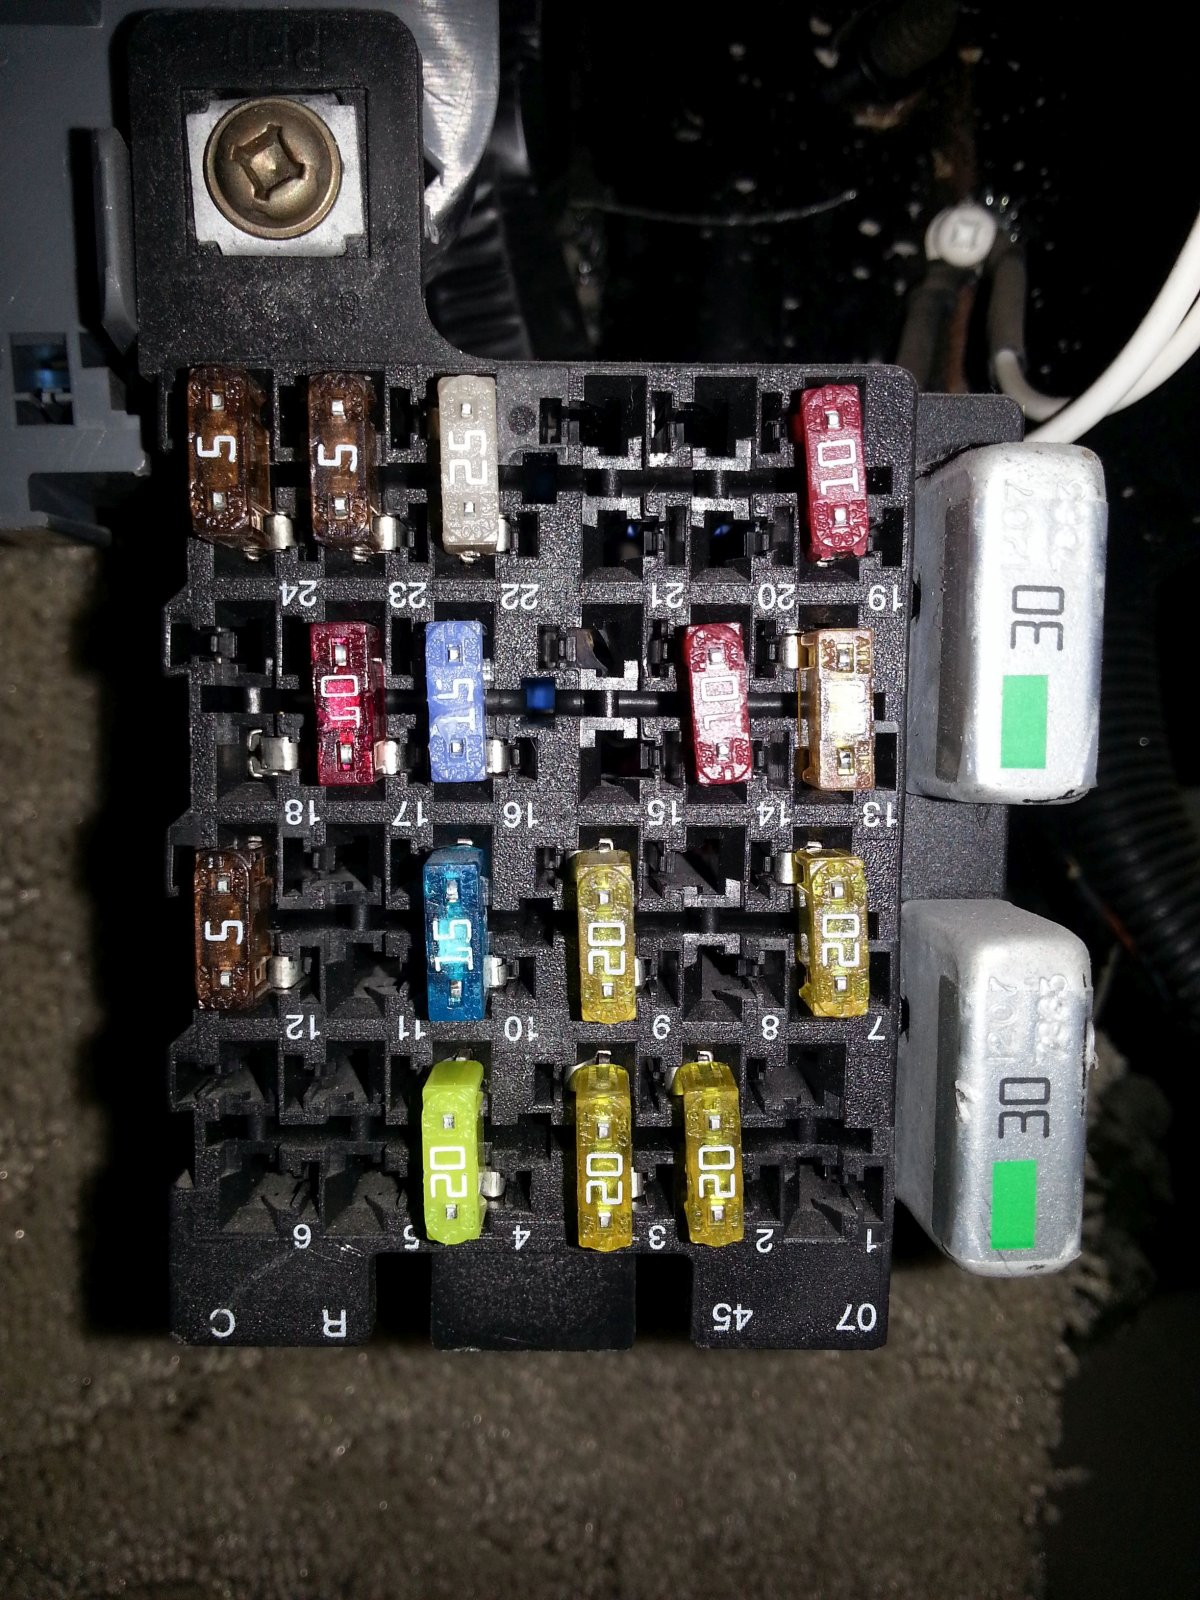 Fuse Box On A Coachman Catalina Rv - Wiring Diagram